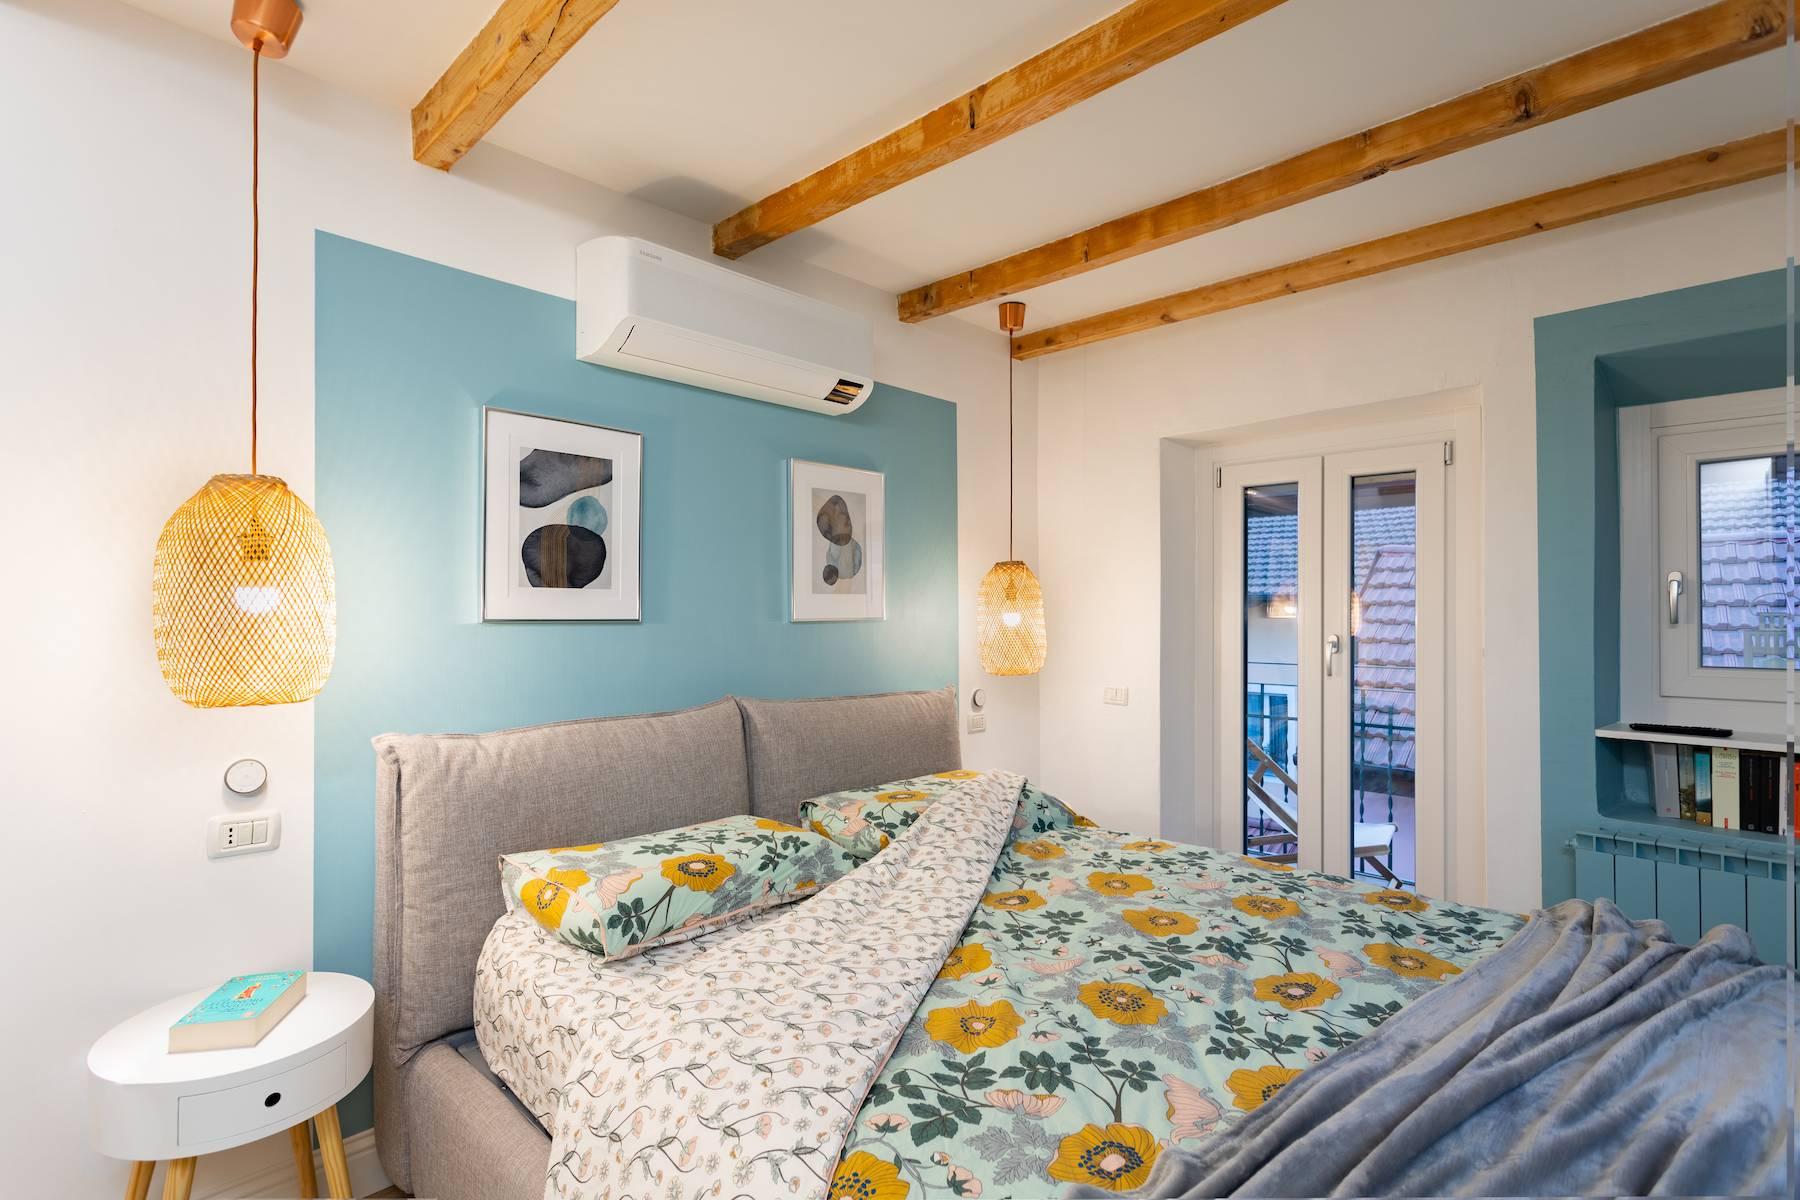 Appartamento in Vendita a Belgirate: 3 locali, 62 mq - Foto 18